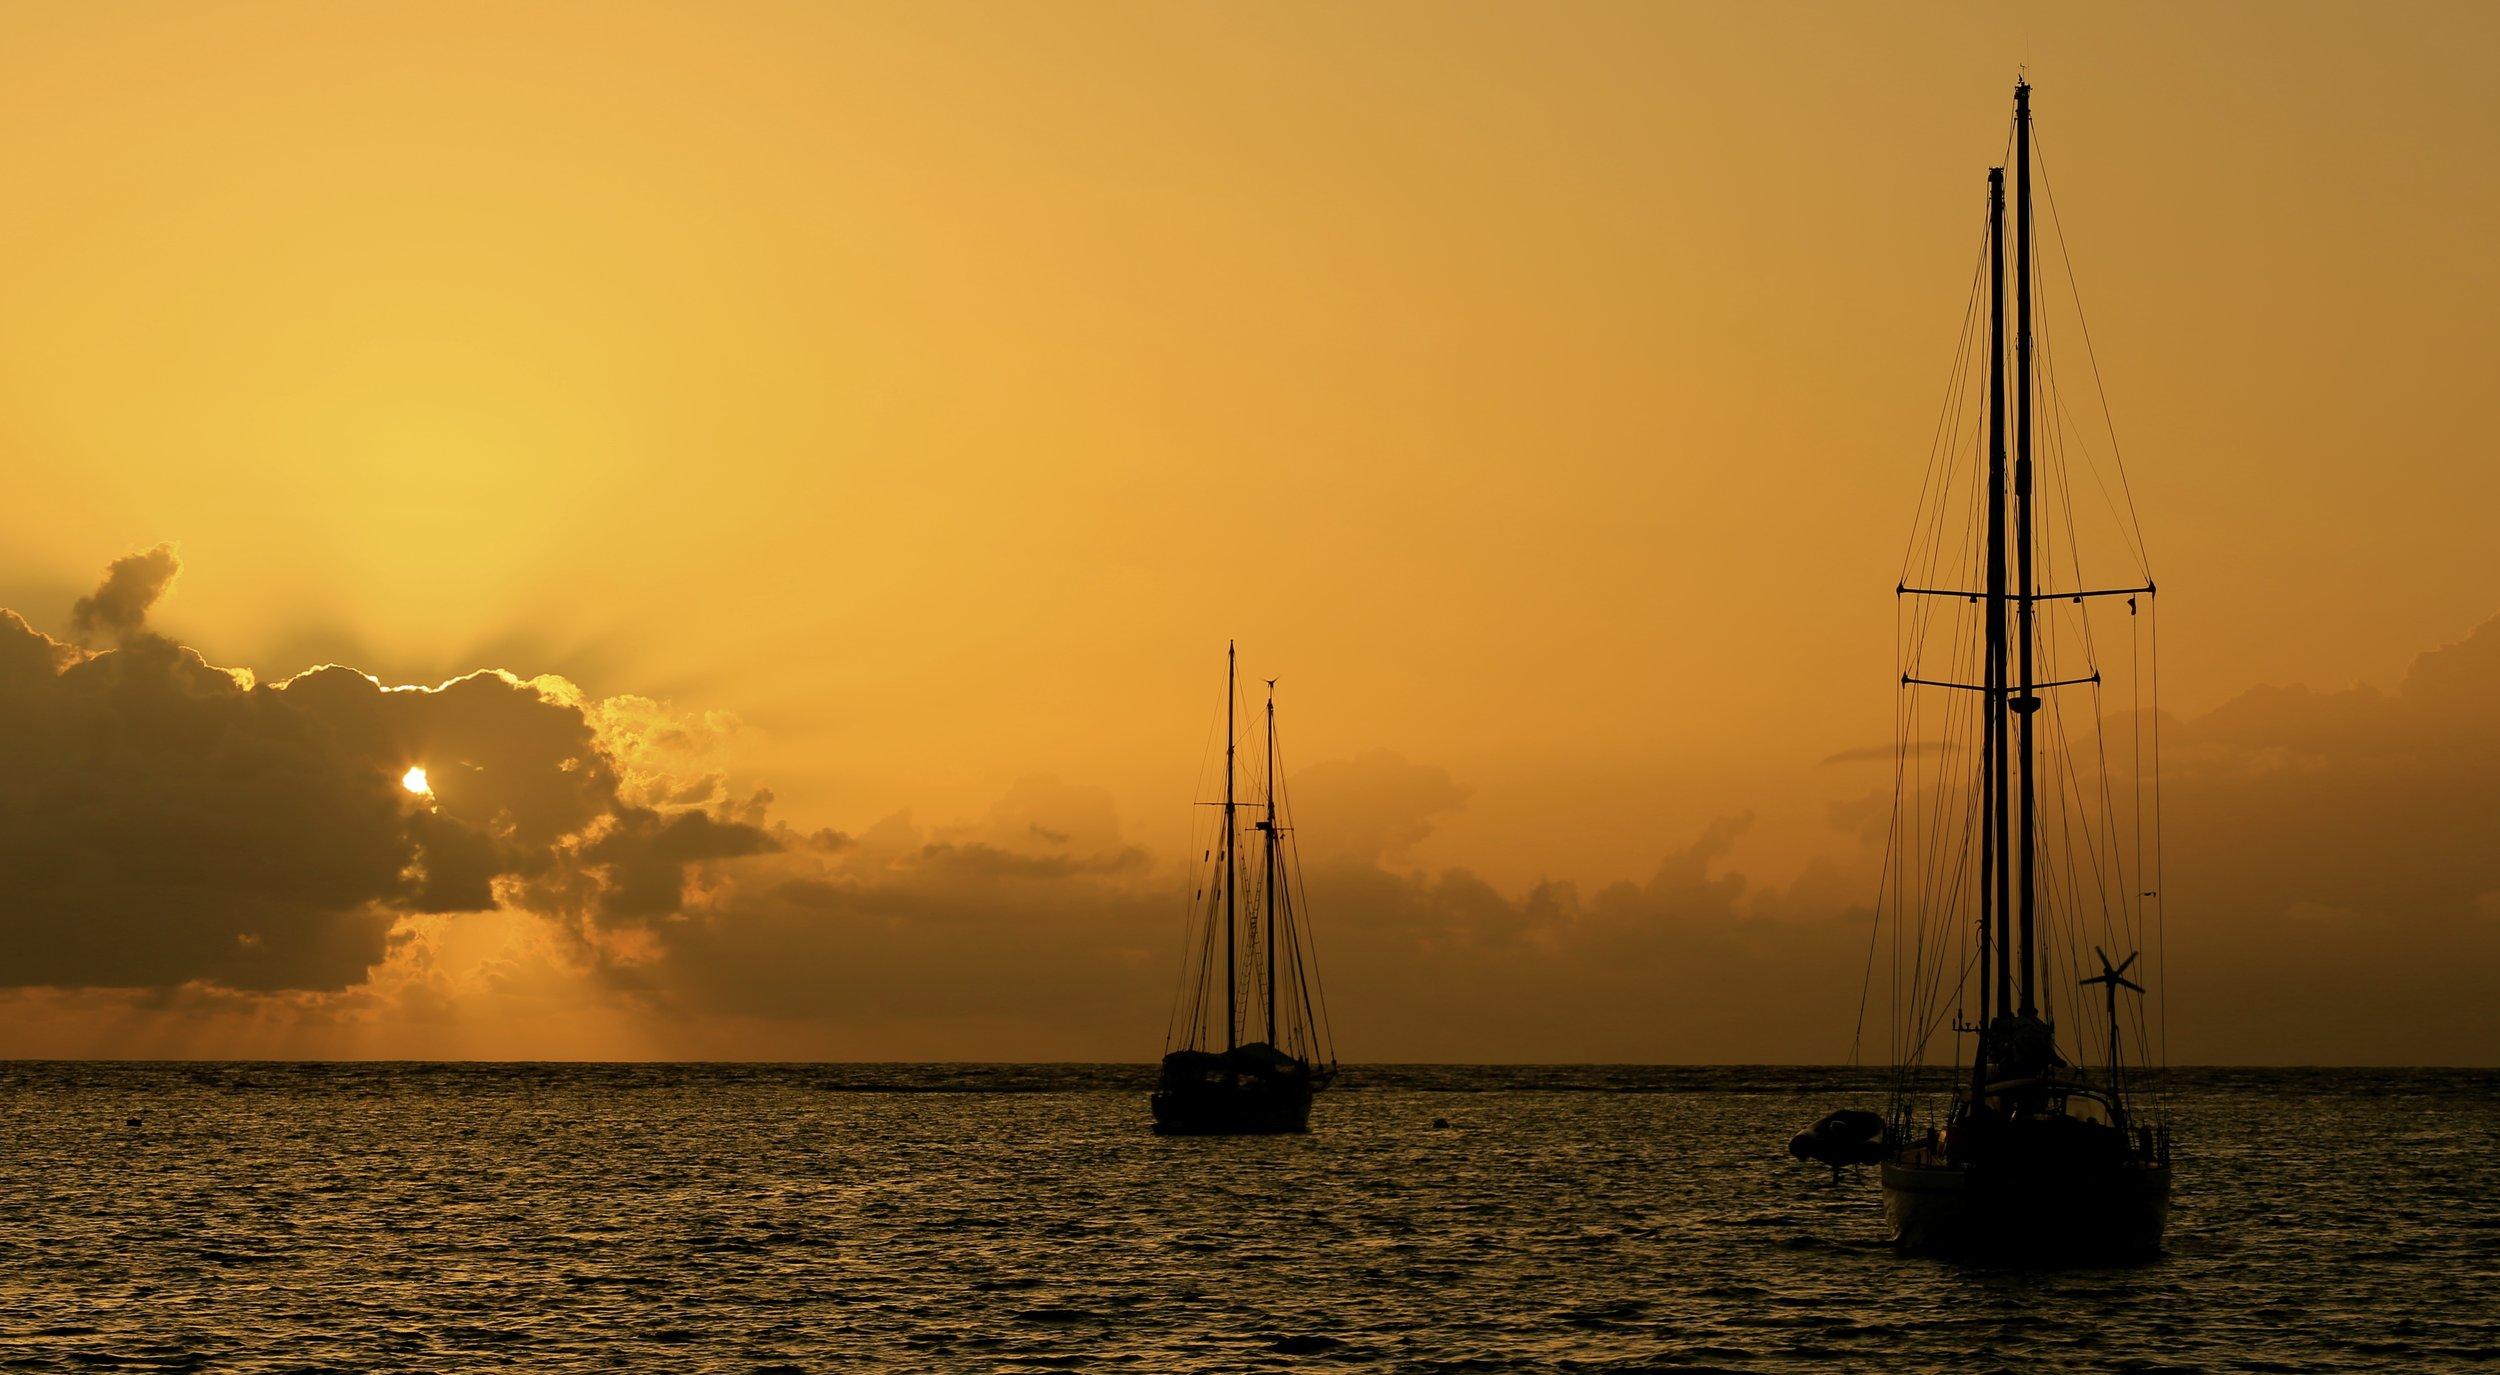 Yachts sunset copy.jpg